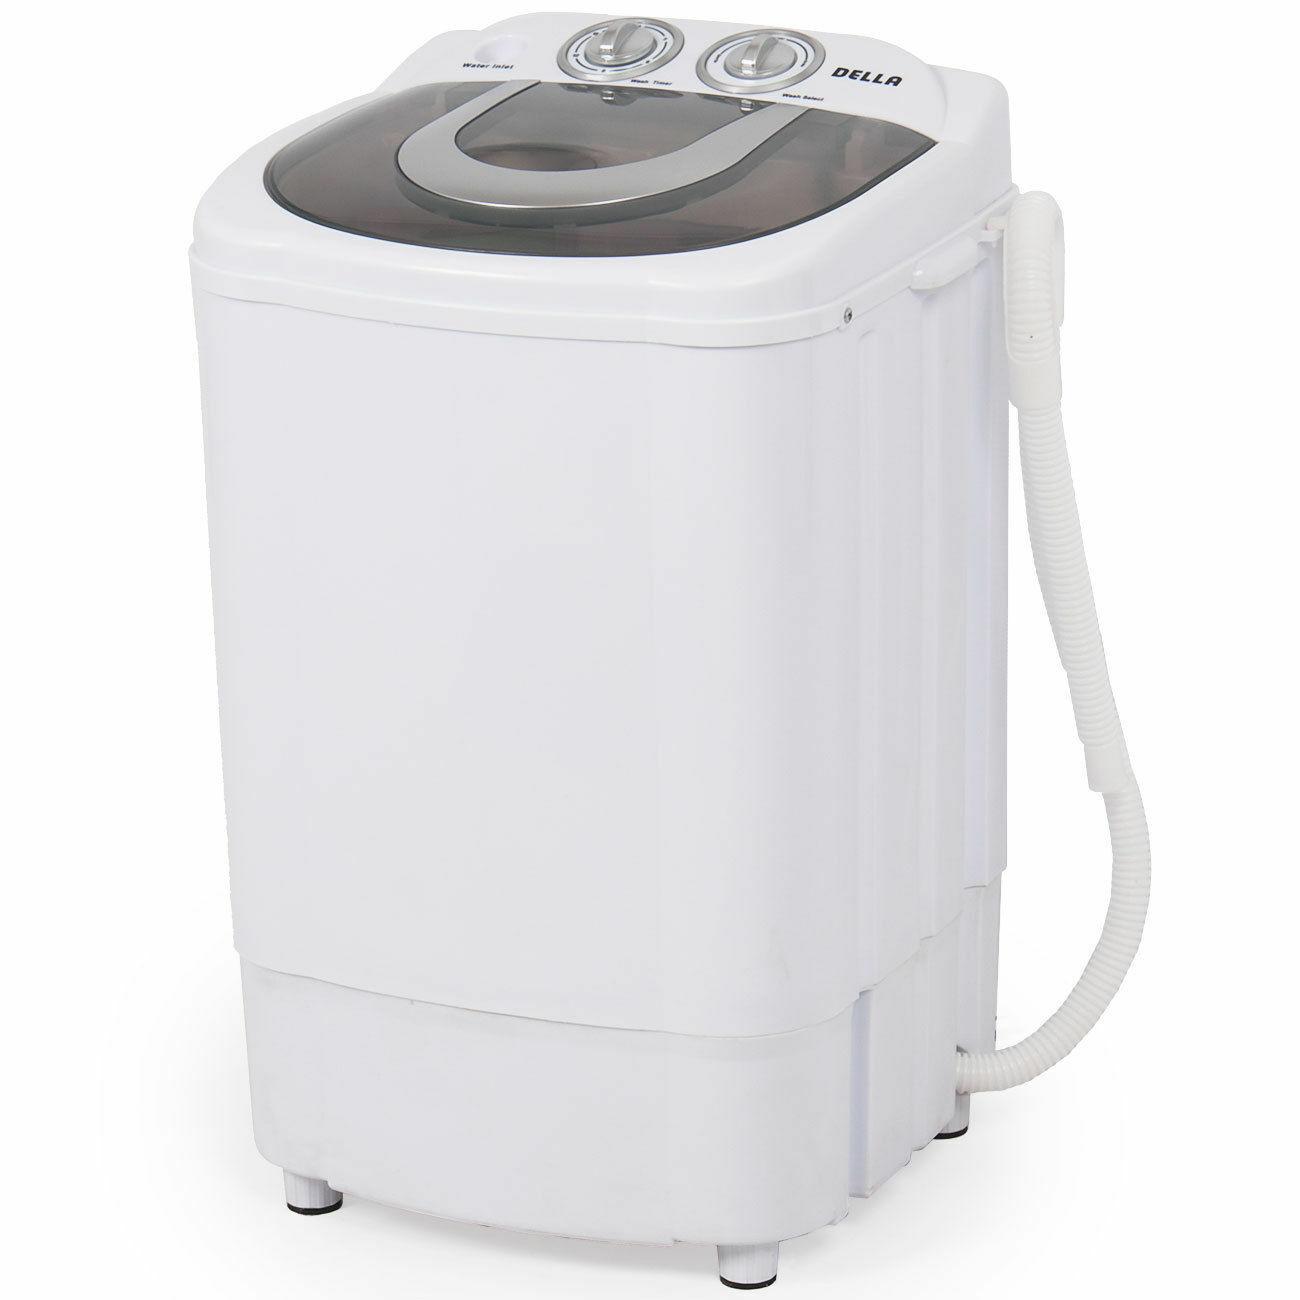 Mini Portable Washing Machine Spin Wash 8.8Lbs Capacity Comp